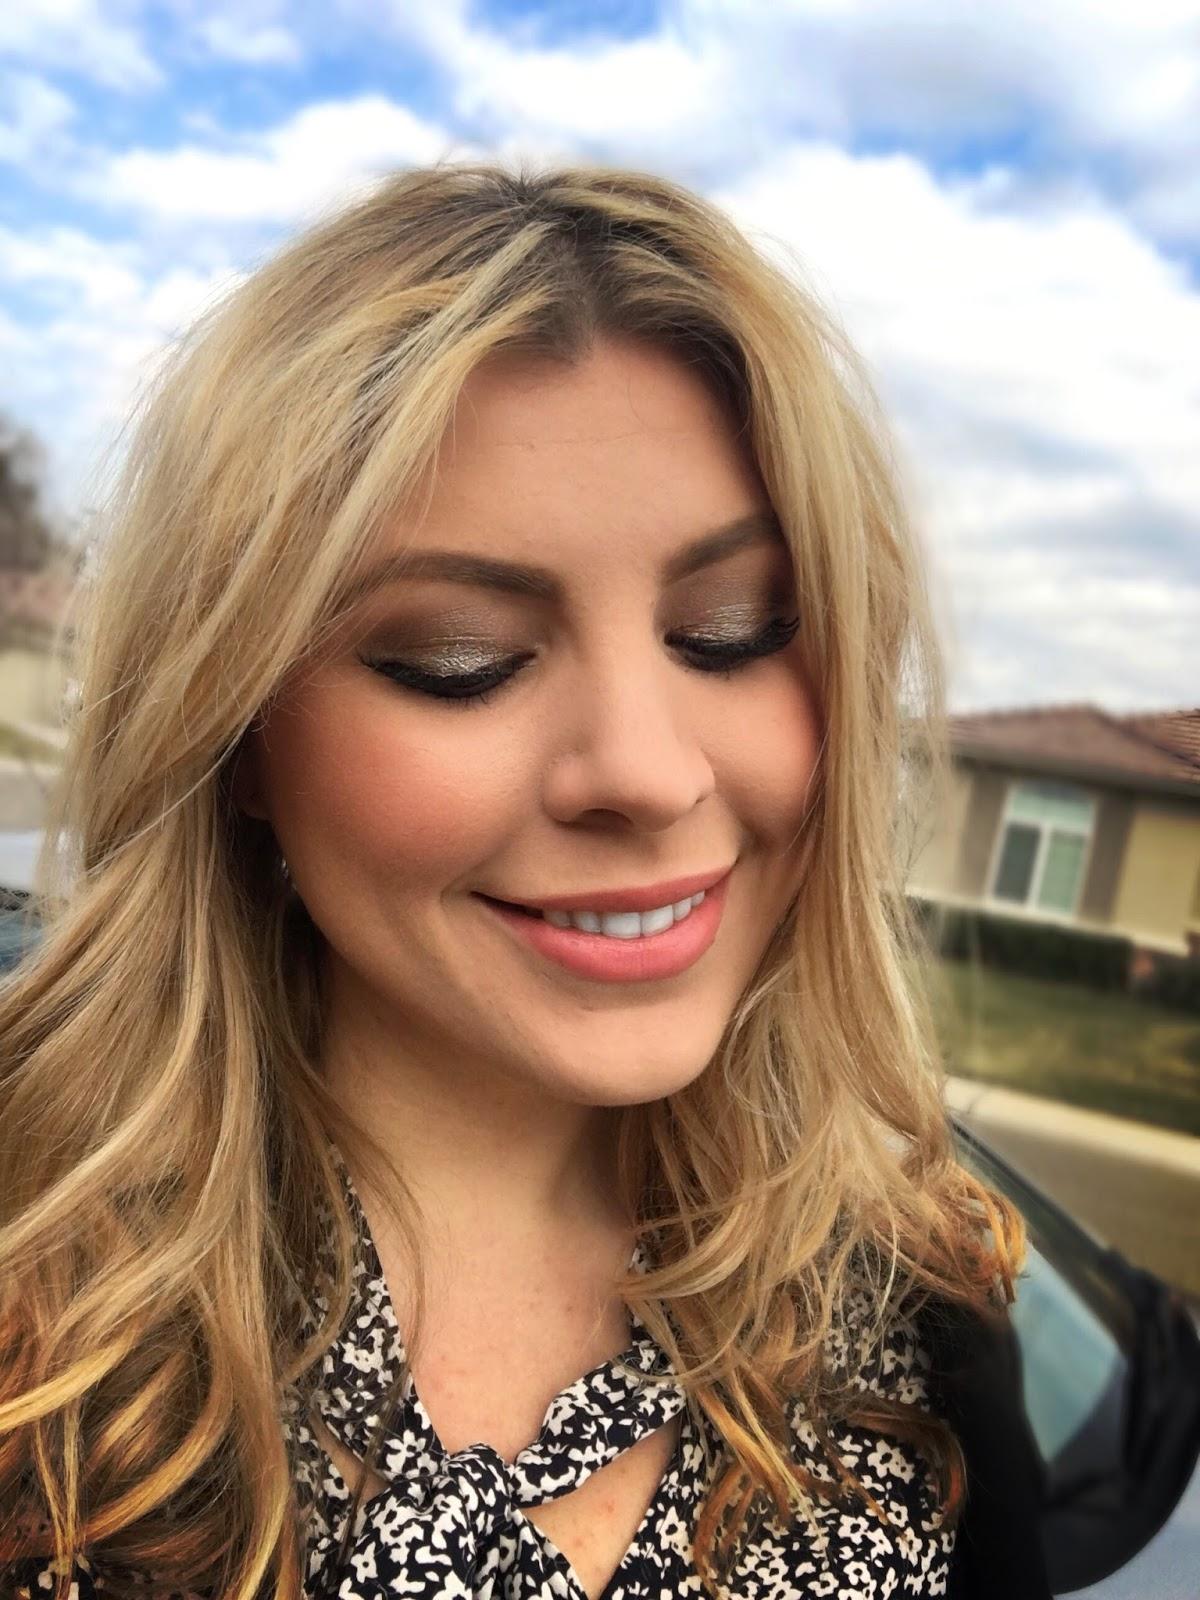 Laura Mercier Caviar Stick Moonstone Hourglass Blush Luminous Flush Chanel Saga Review